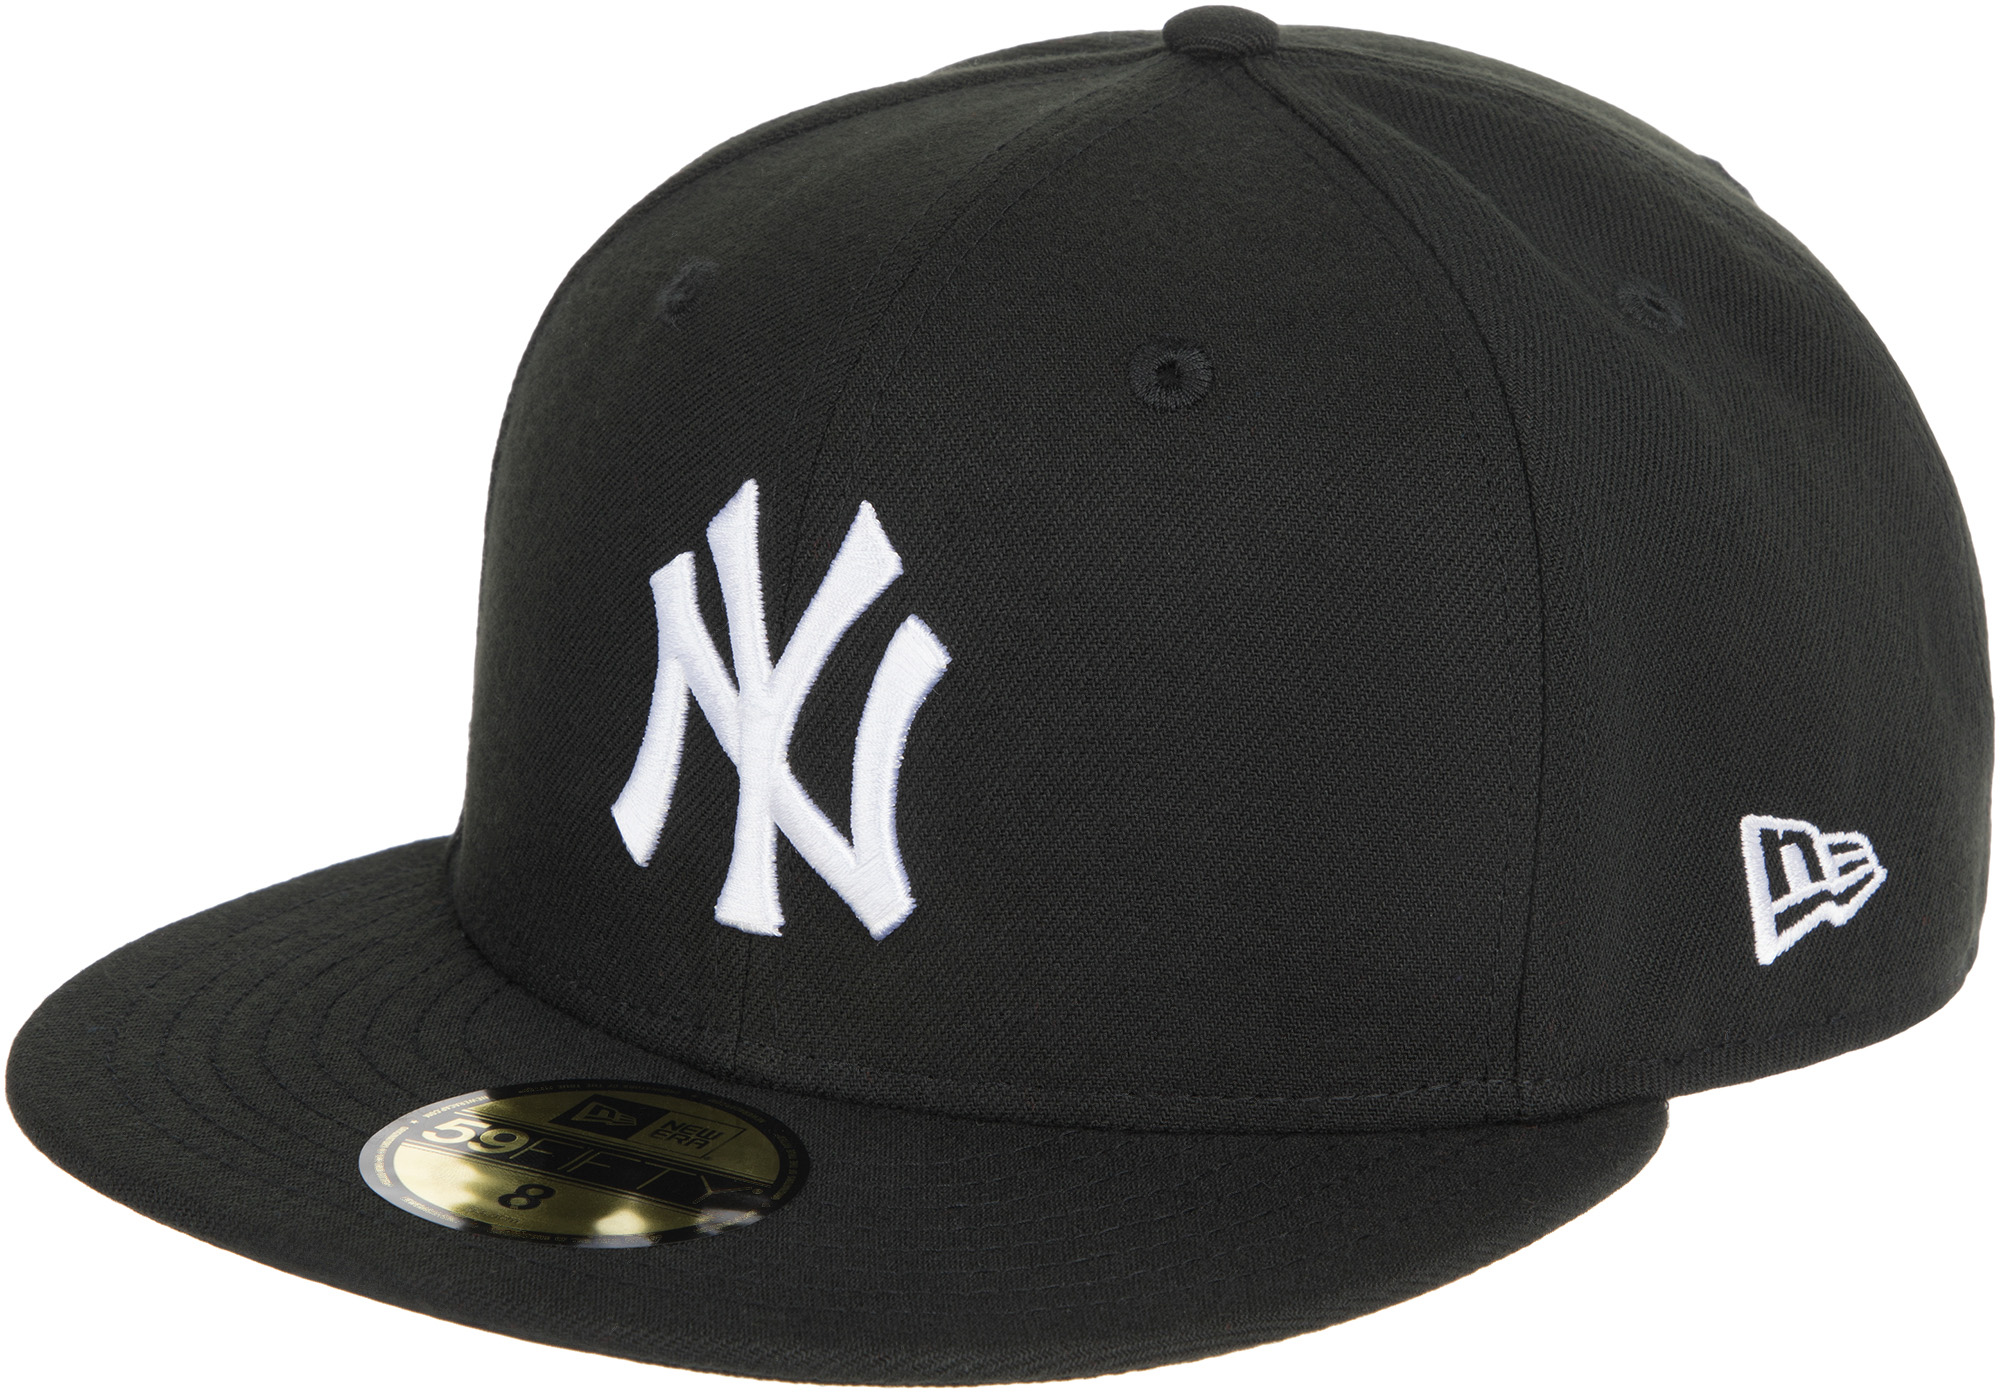 New Era Бейсболка New Era MLB NY Yankees, размер 55 головной убор new era 59fifty los angeles dodgers mlb